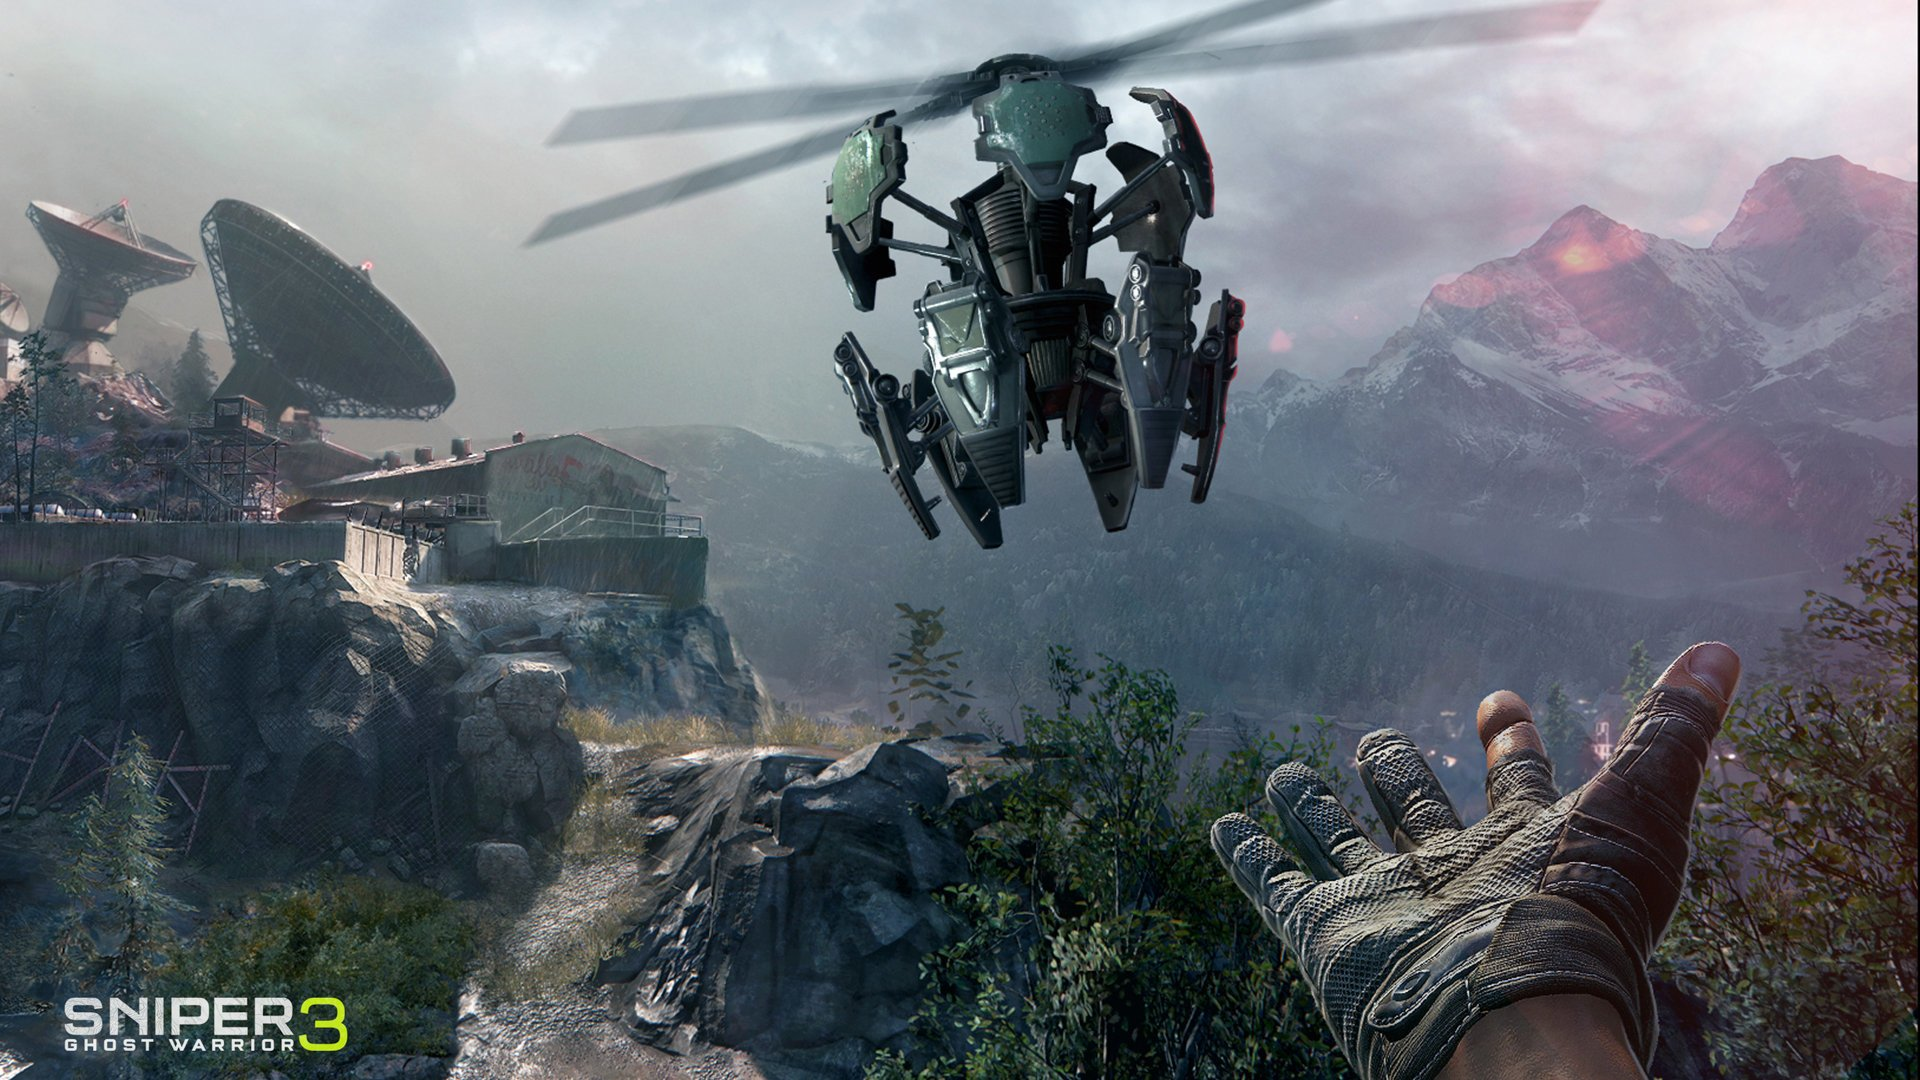 Sniper: Ghost Warrior 3 HD Wallpaper